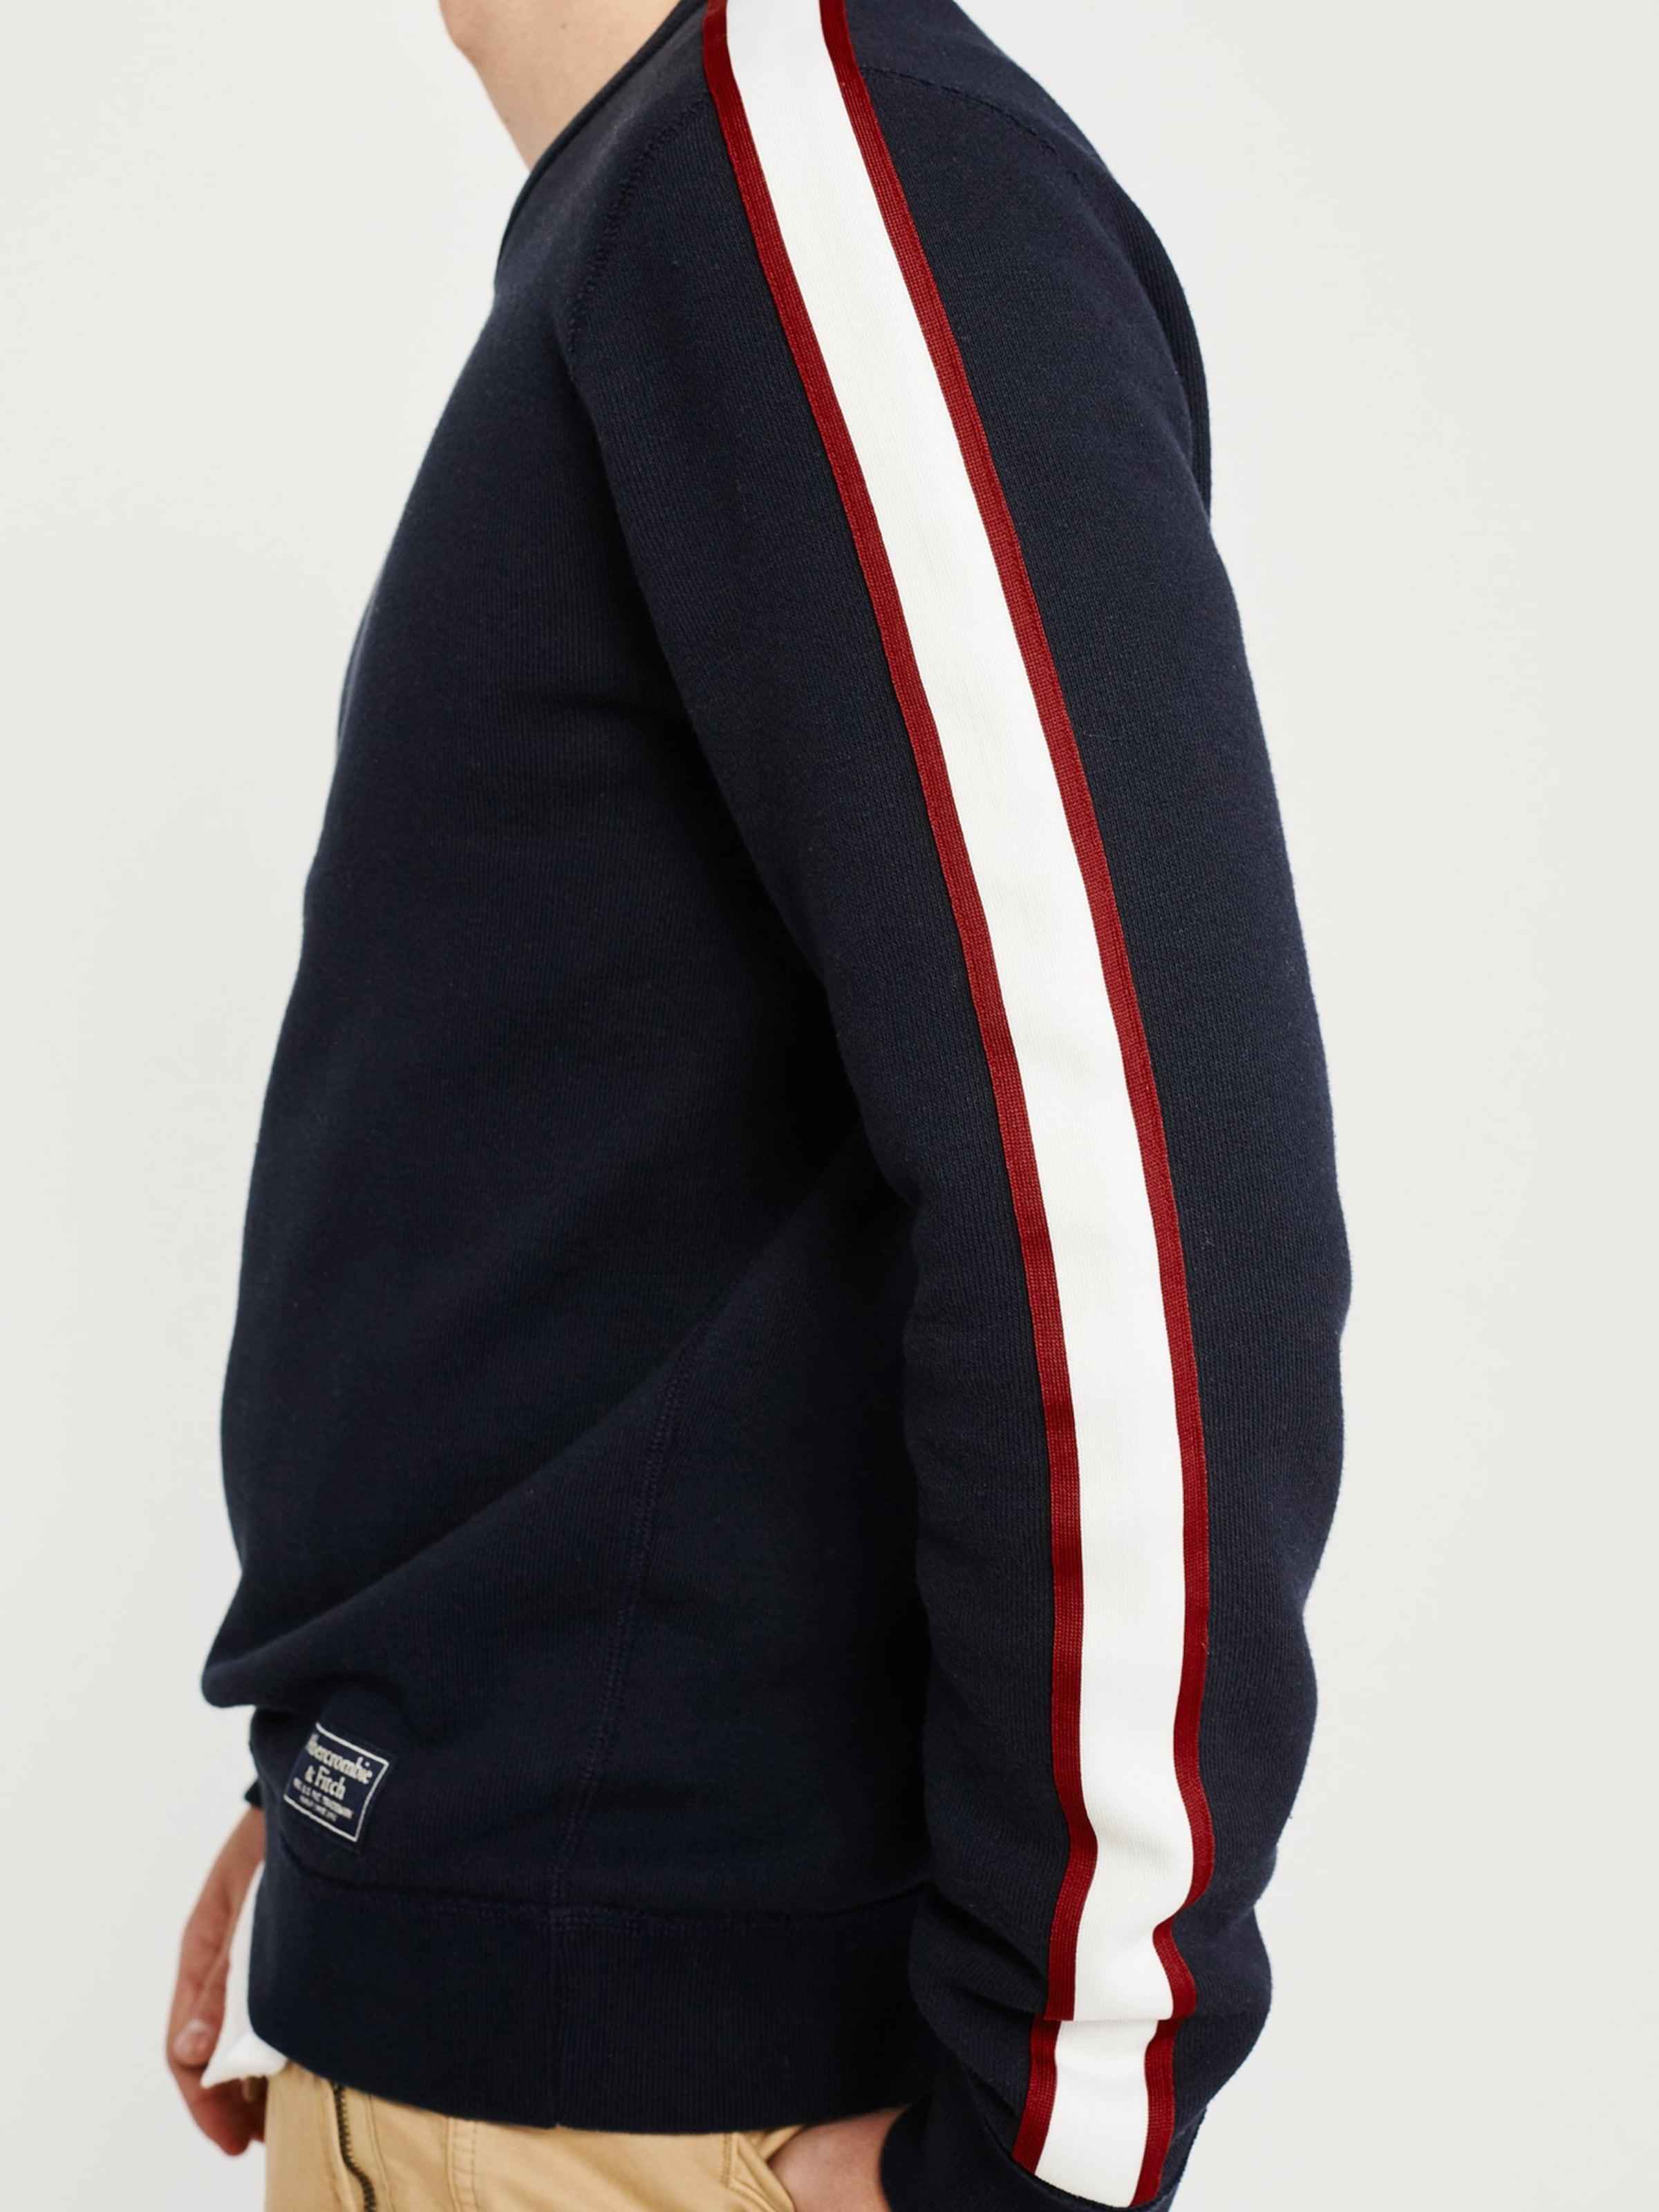 Abercrombieamp; 'sleeve shirt Marine En Crew' Bleu Sweat Tape Fitch wOkn0P